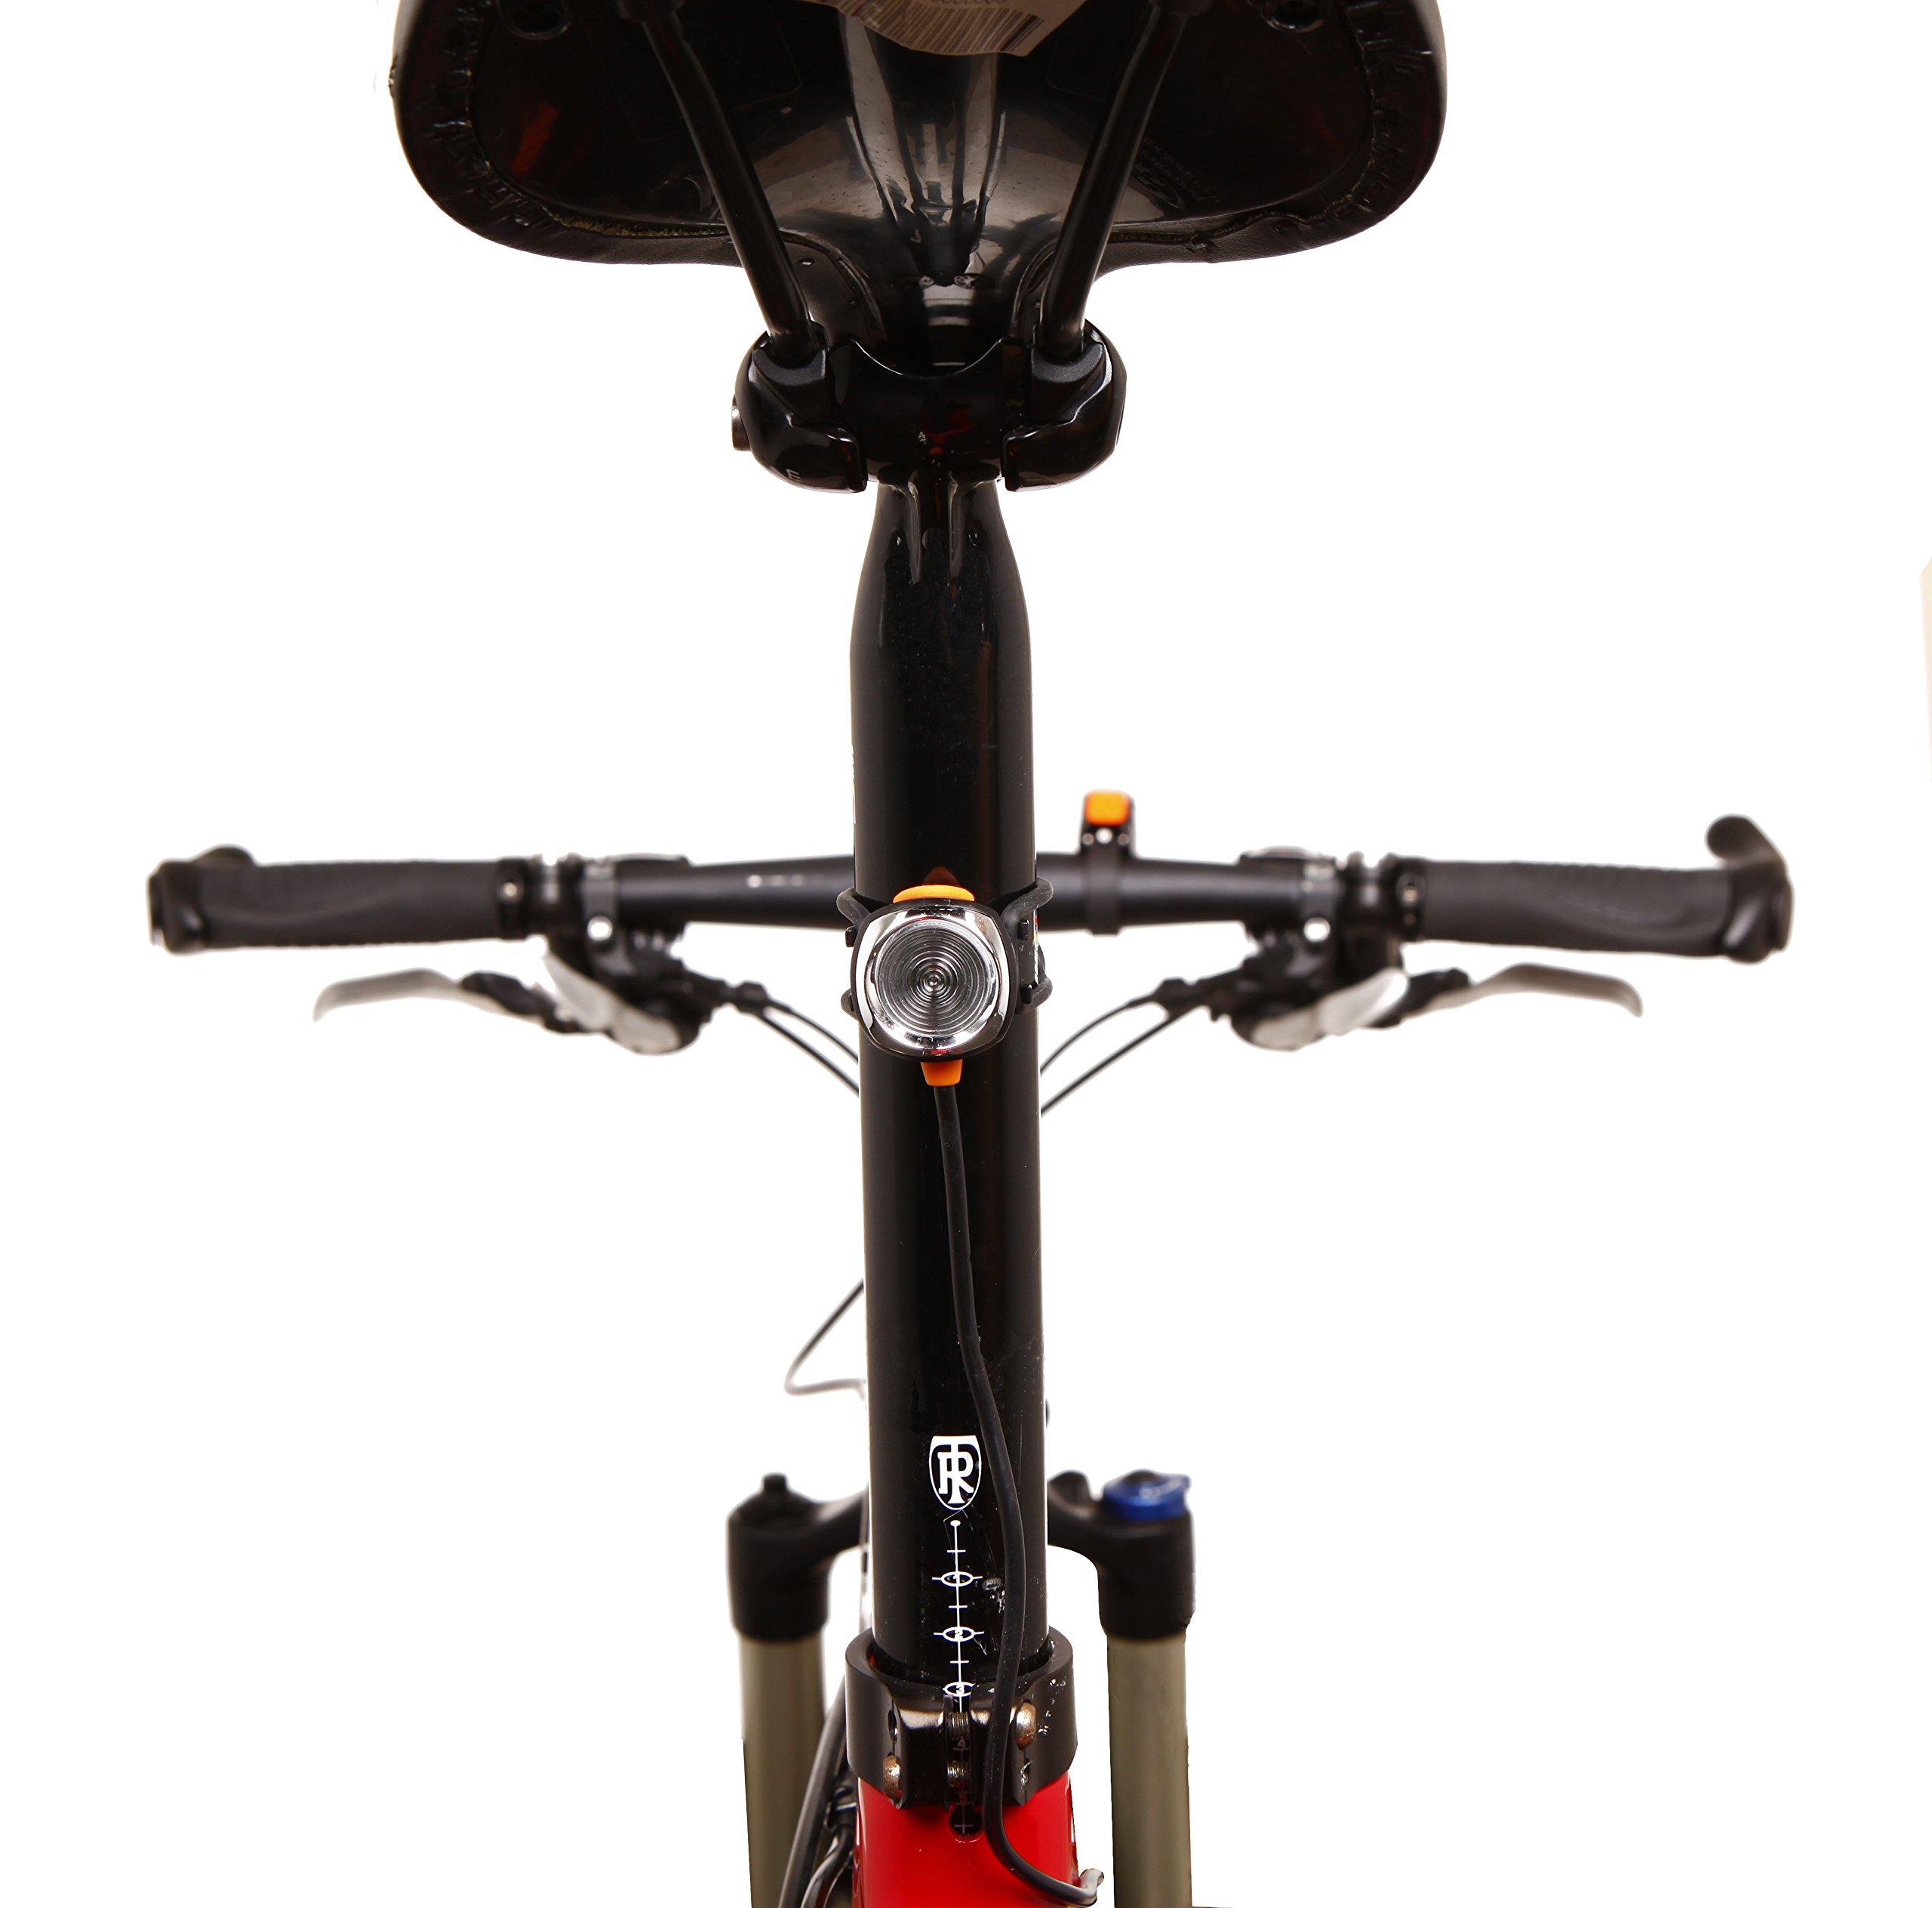 Magicshine MJ 906, High Grade MTB Enduro Bike Light Set, 5000 Lumens of Max output. Wireless Remote Bicycle Lights Front And Rear Combo, LED Bike Tail Light, Perfect Beam Pattern Bright Bike Light by Magicshine (Image #9)